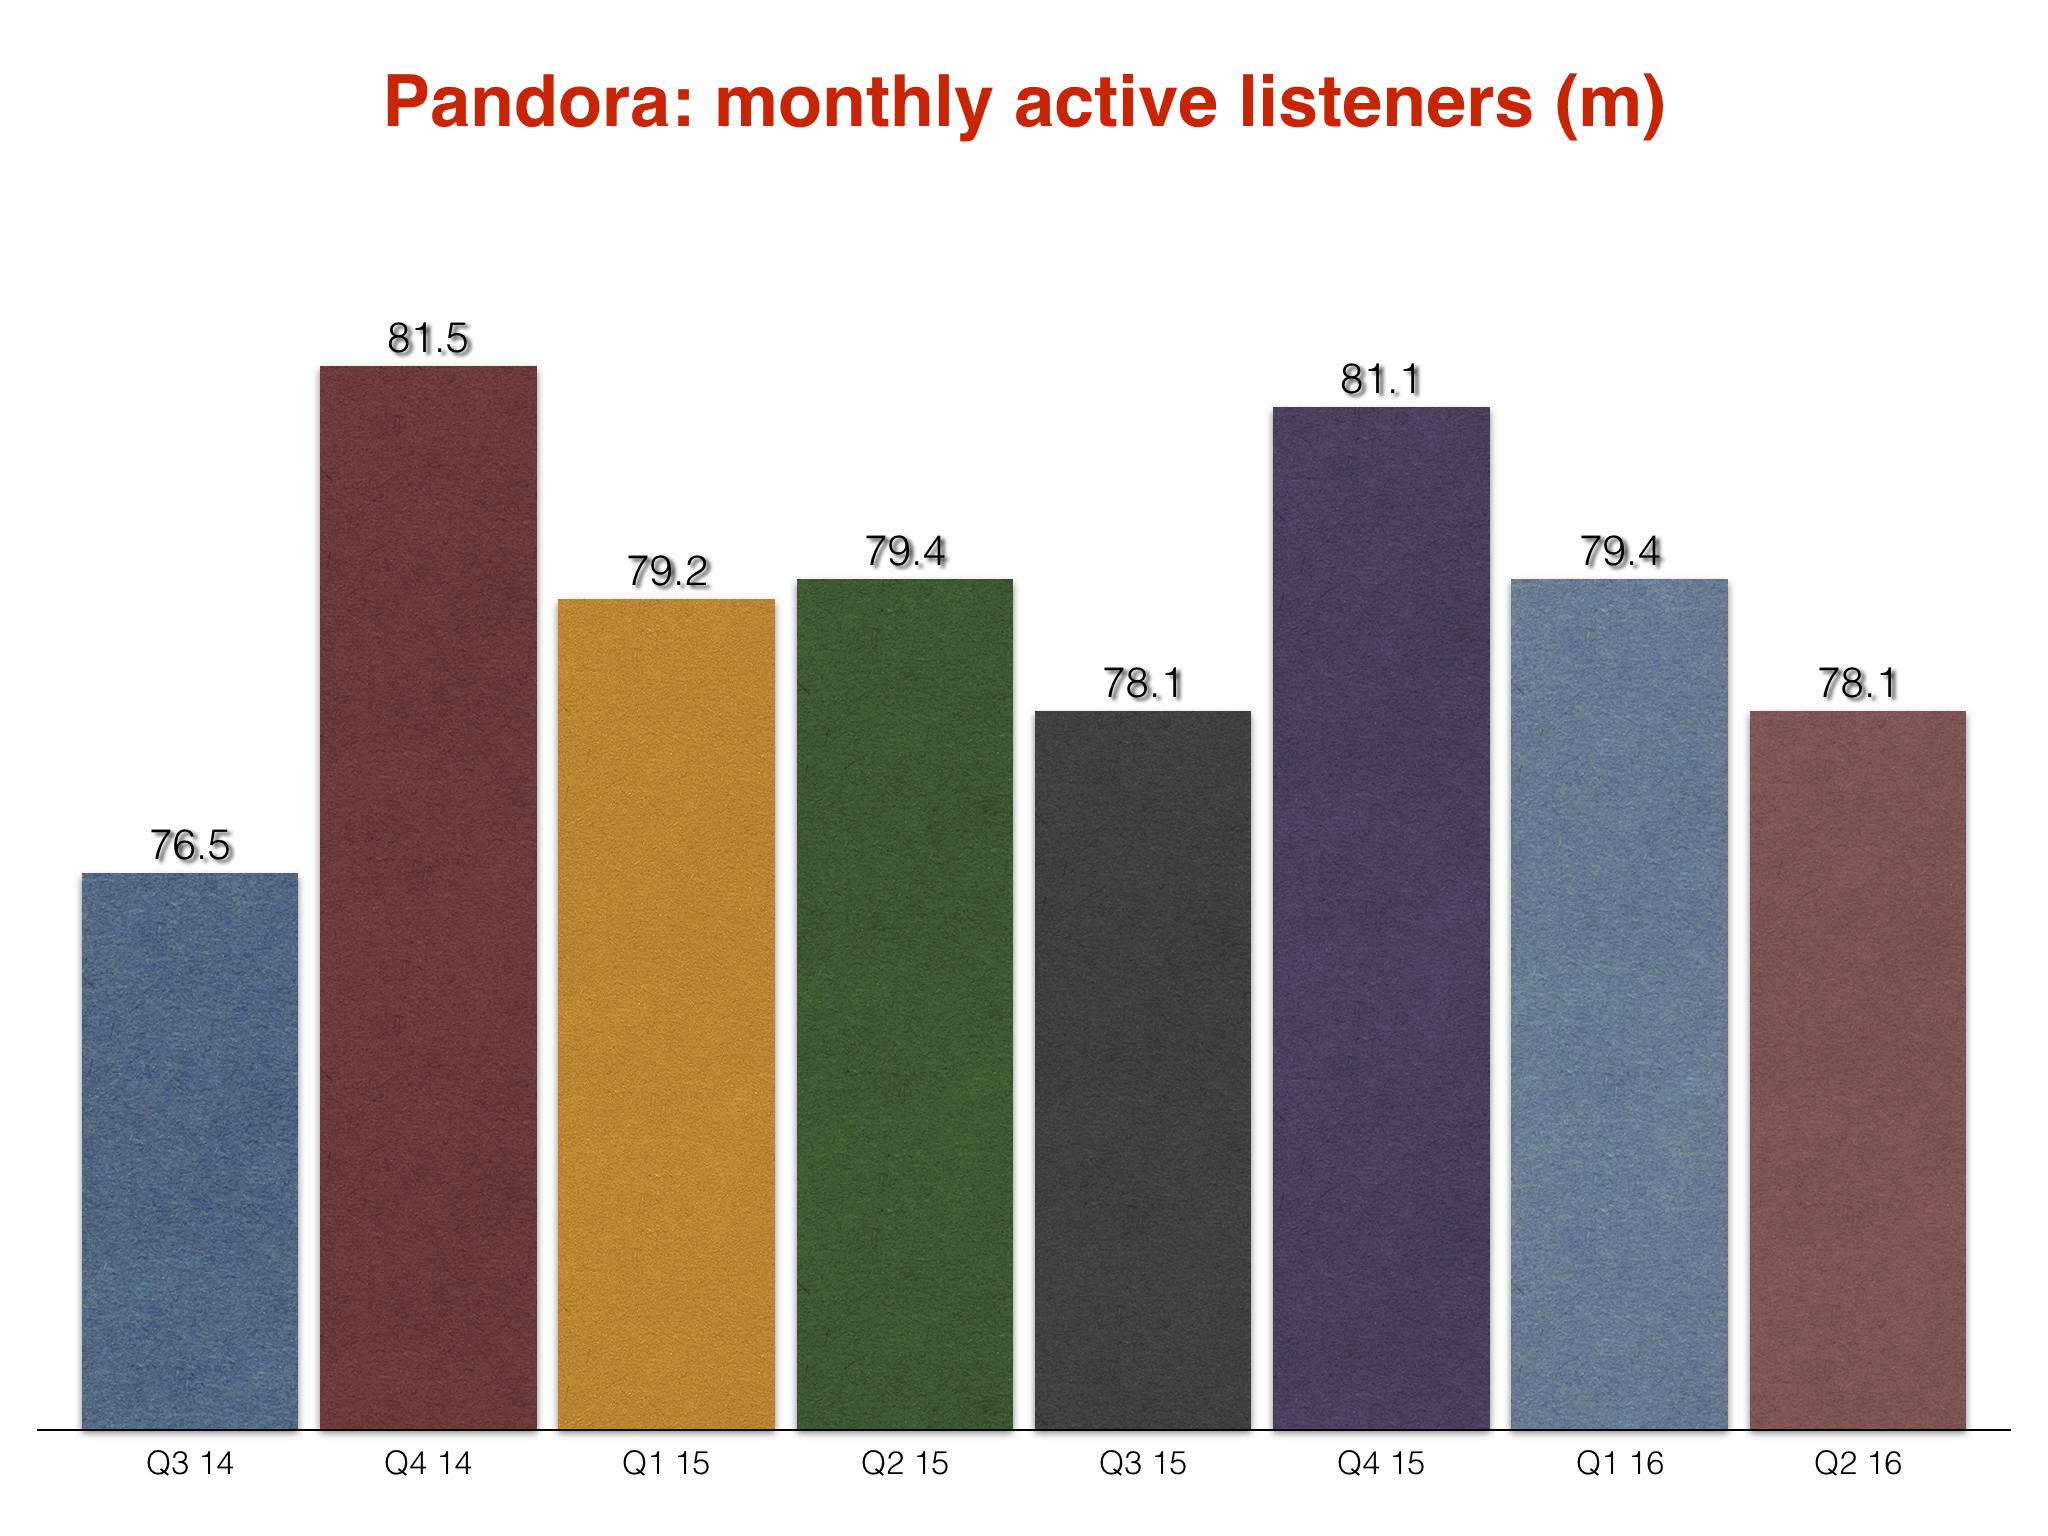 Pandora listeners